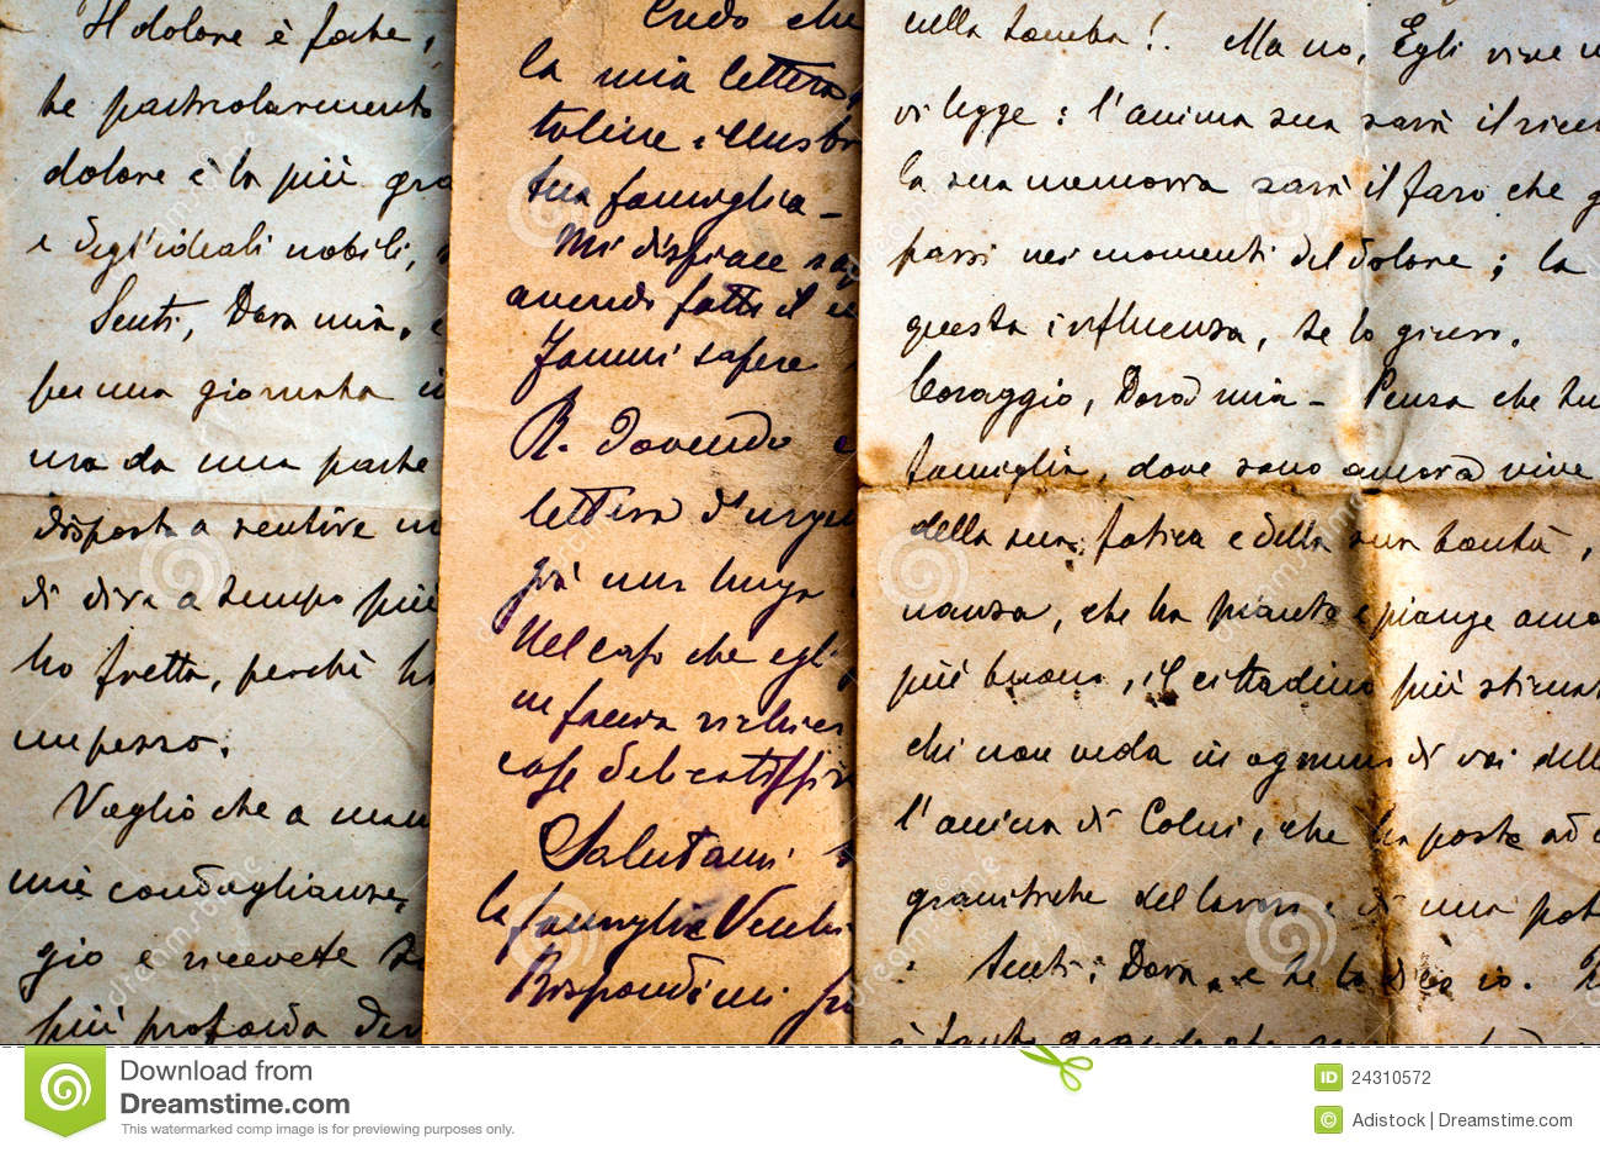 poetica essay Stories, poems, essays, and reviews since 1926 main menu home essay sherman alexie - victory an ars poetica, essay.